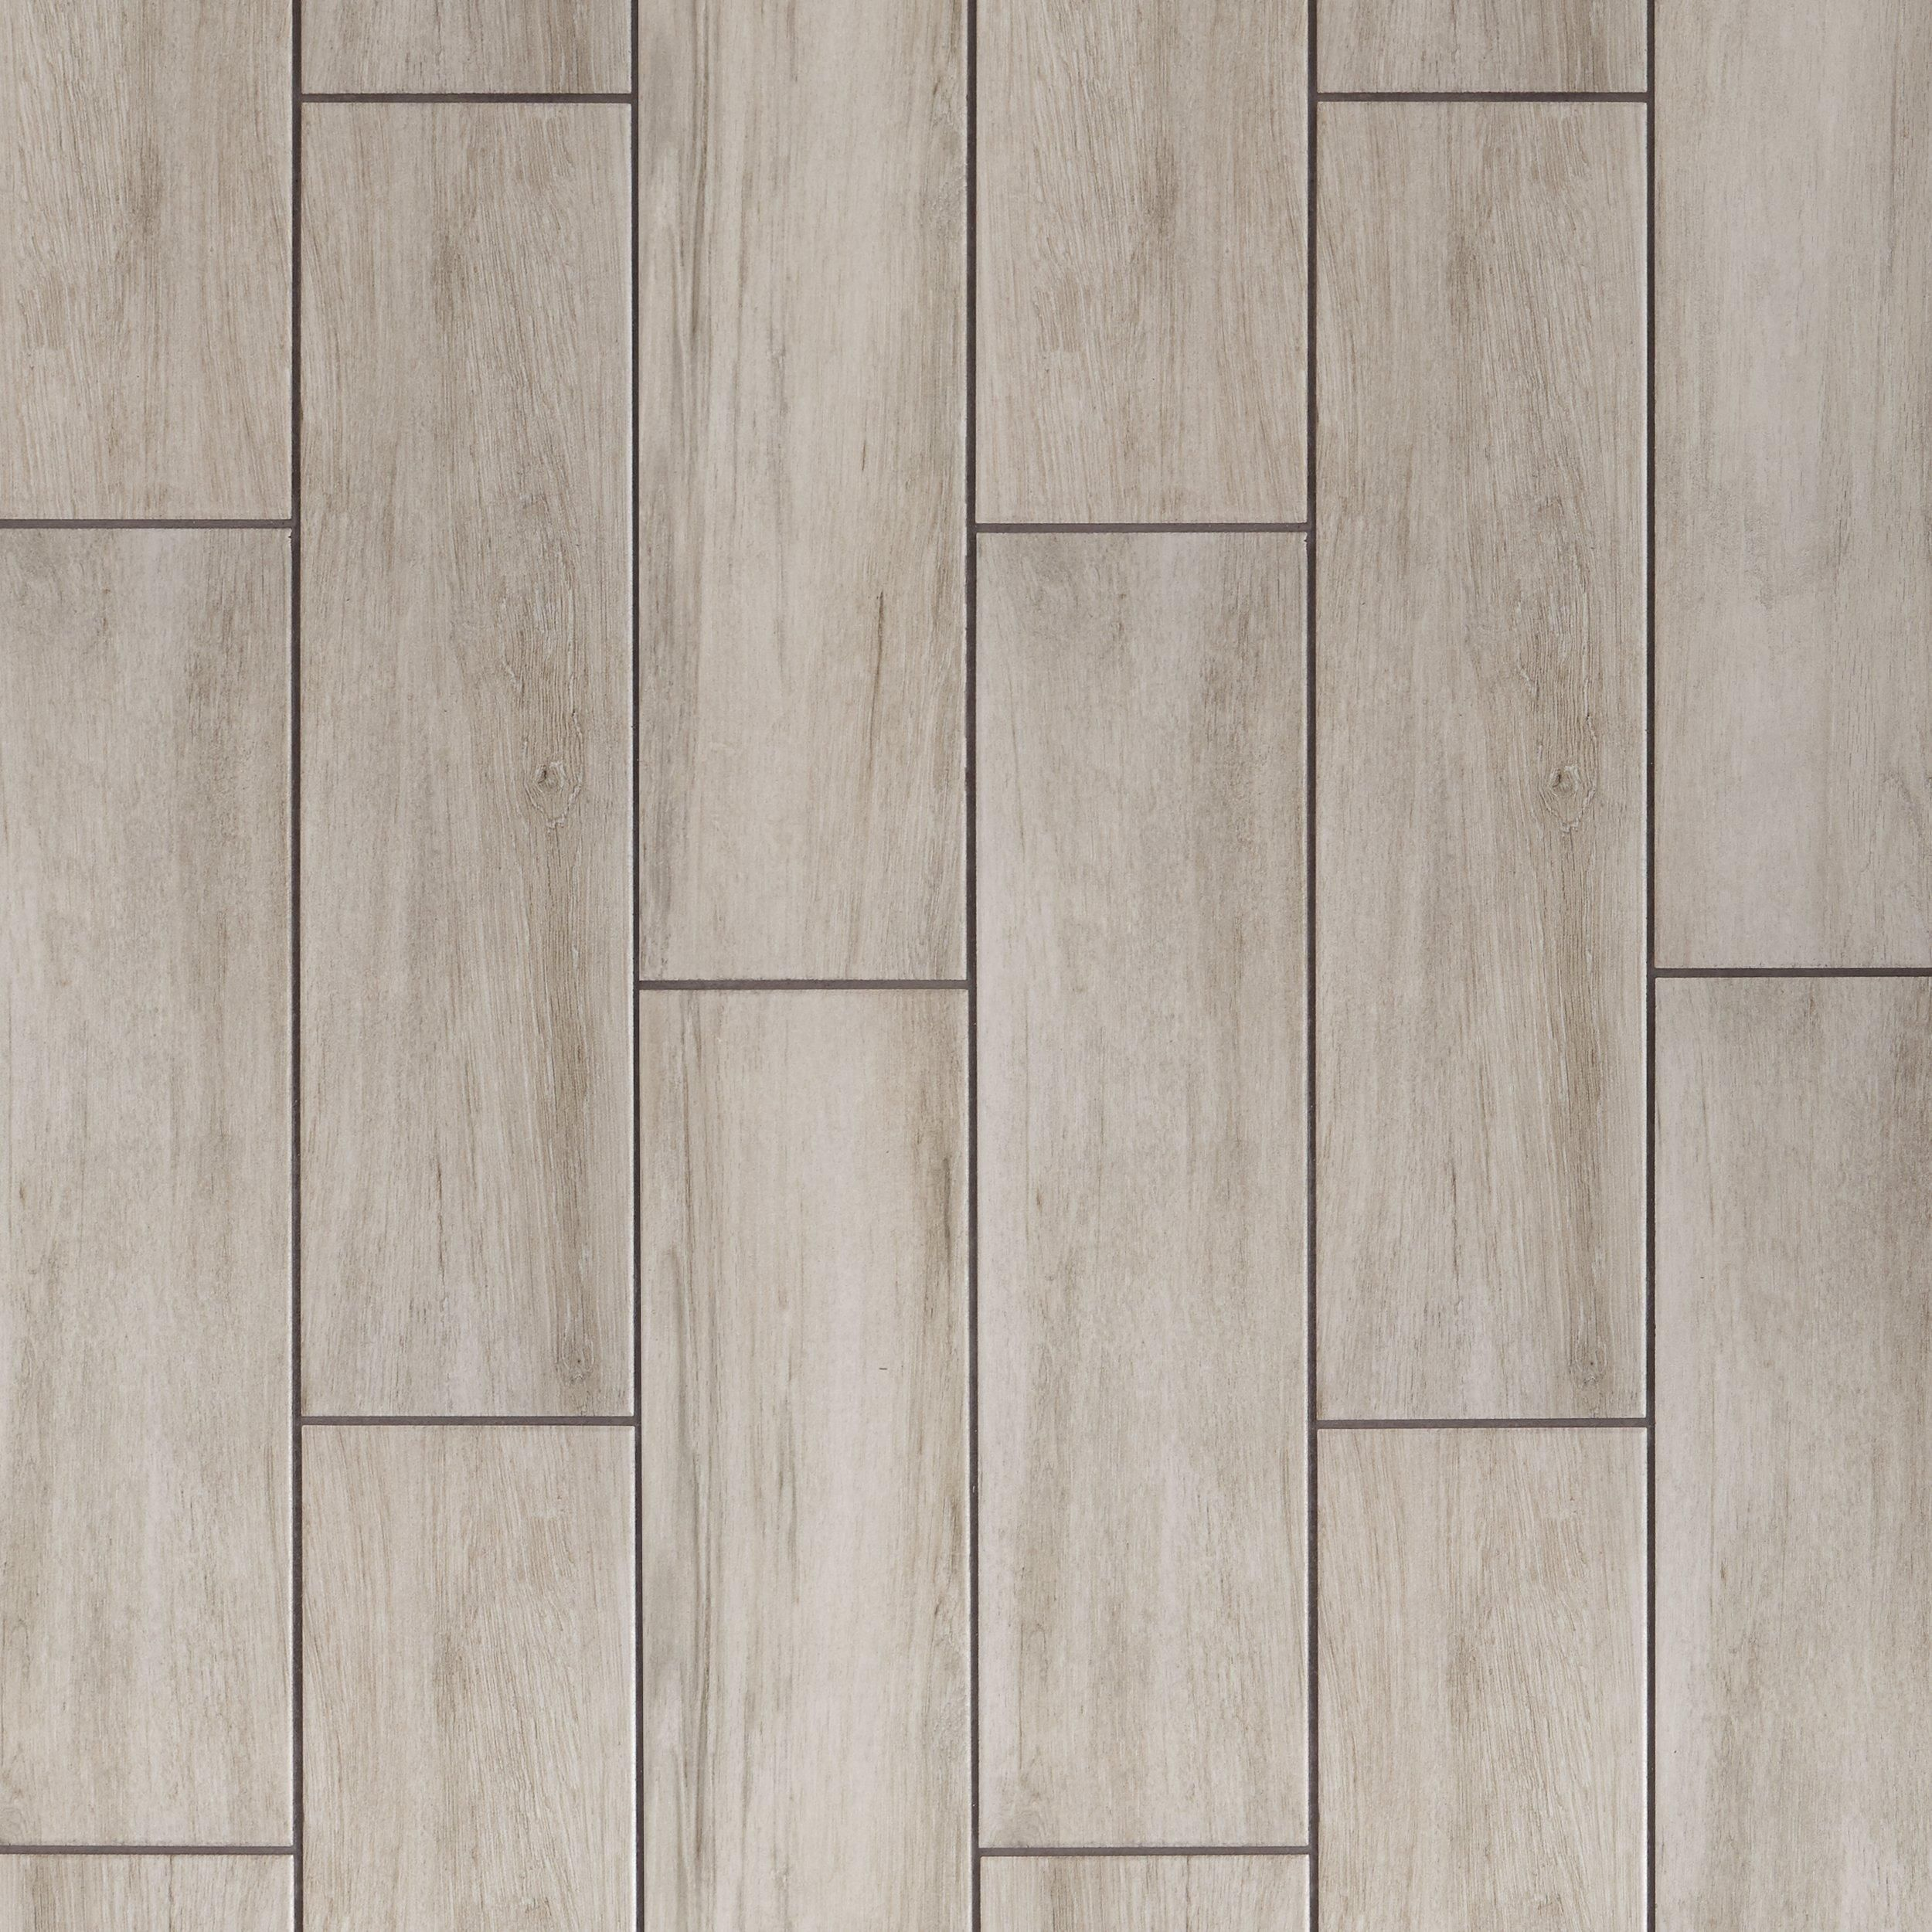 Carson Gray Wood Plank Ceramic Tile Wood Ceramic Tiles Grey Wood Plank Tile Flooring